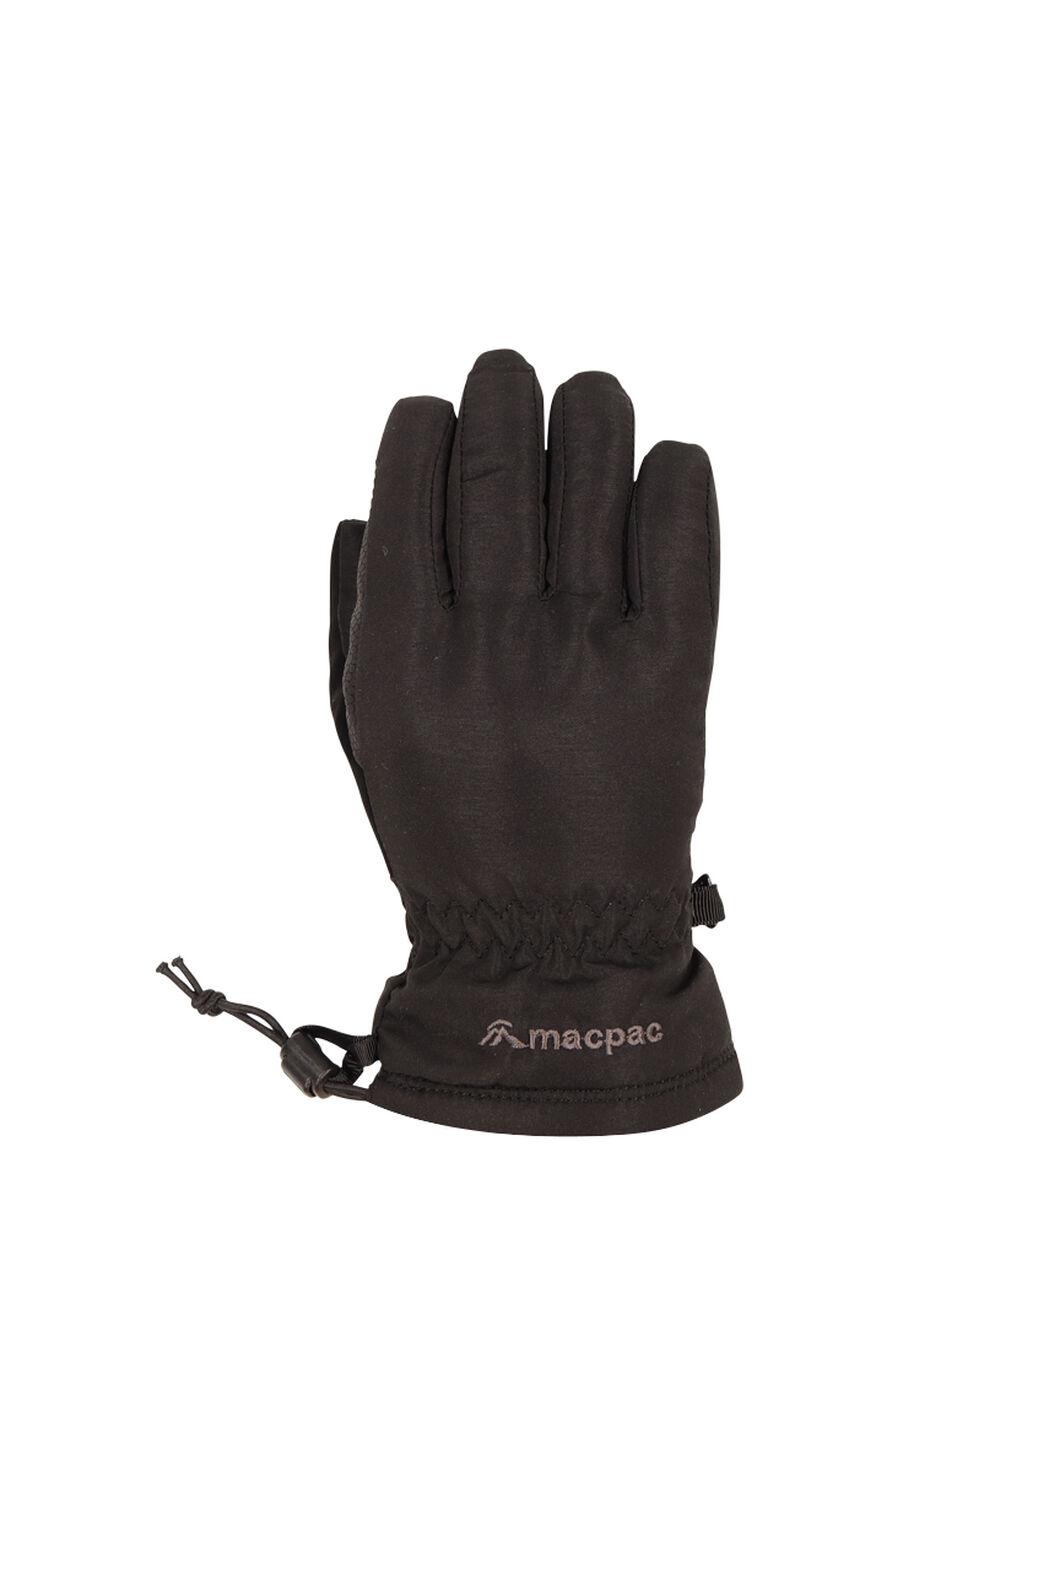 Macpac Spree Ski Gloves, Black, hi-res